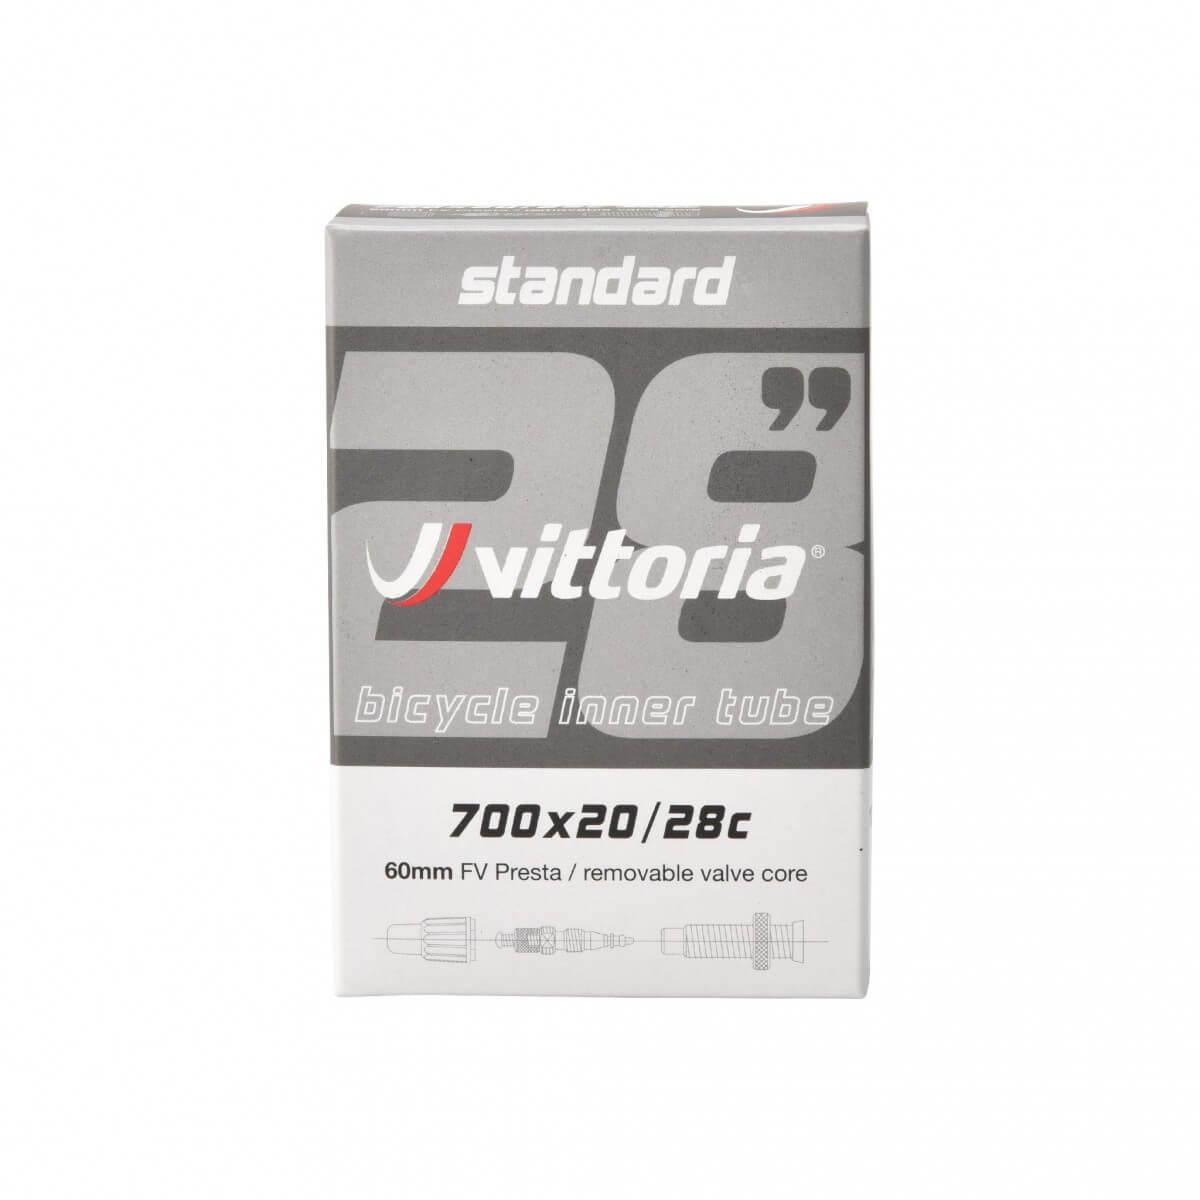 Cámara Vittoria STANDARD 700x20/28c Válvula 60 mm